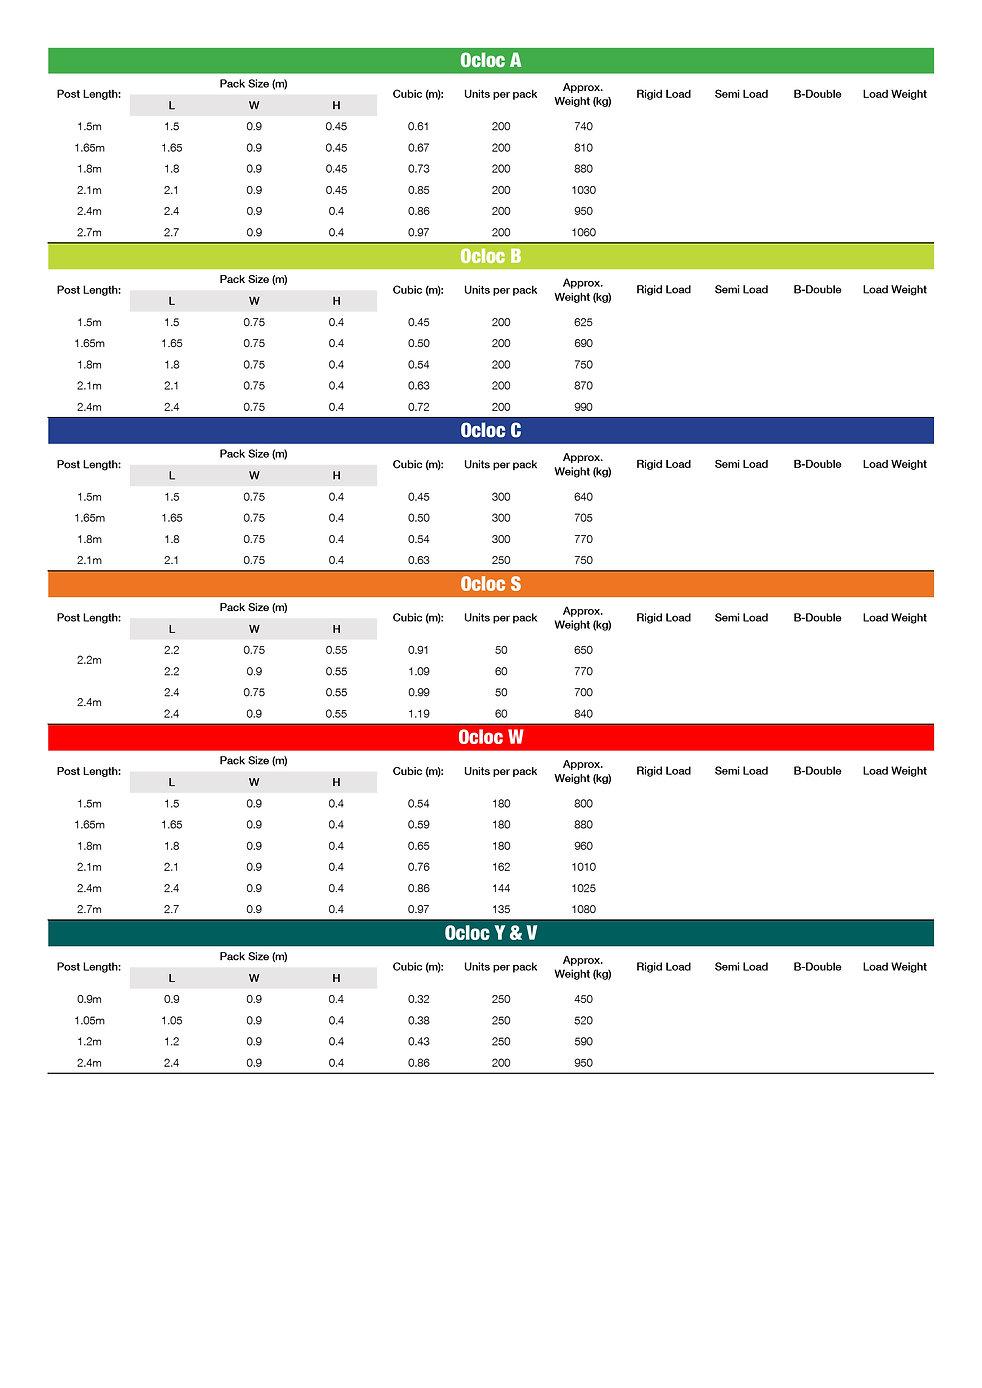 Ocloc Vineyard Posts - Pack Sizes & Info